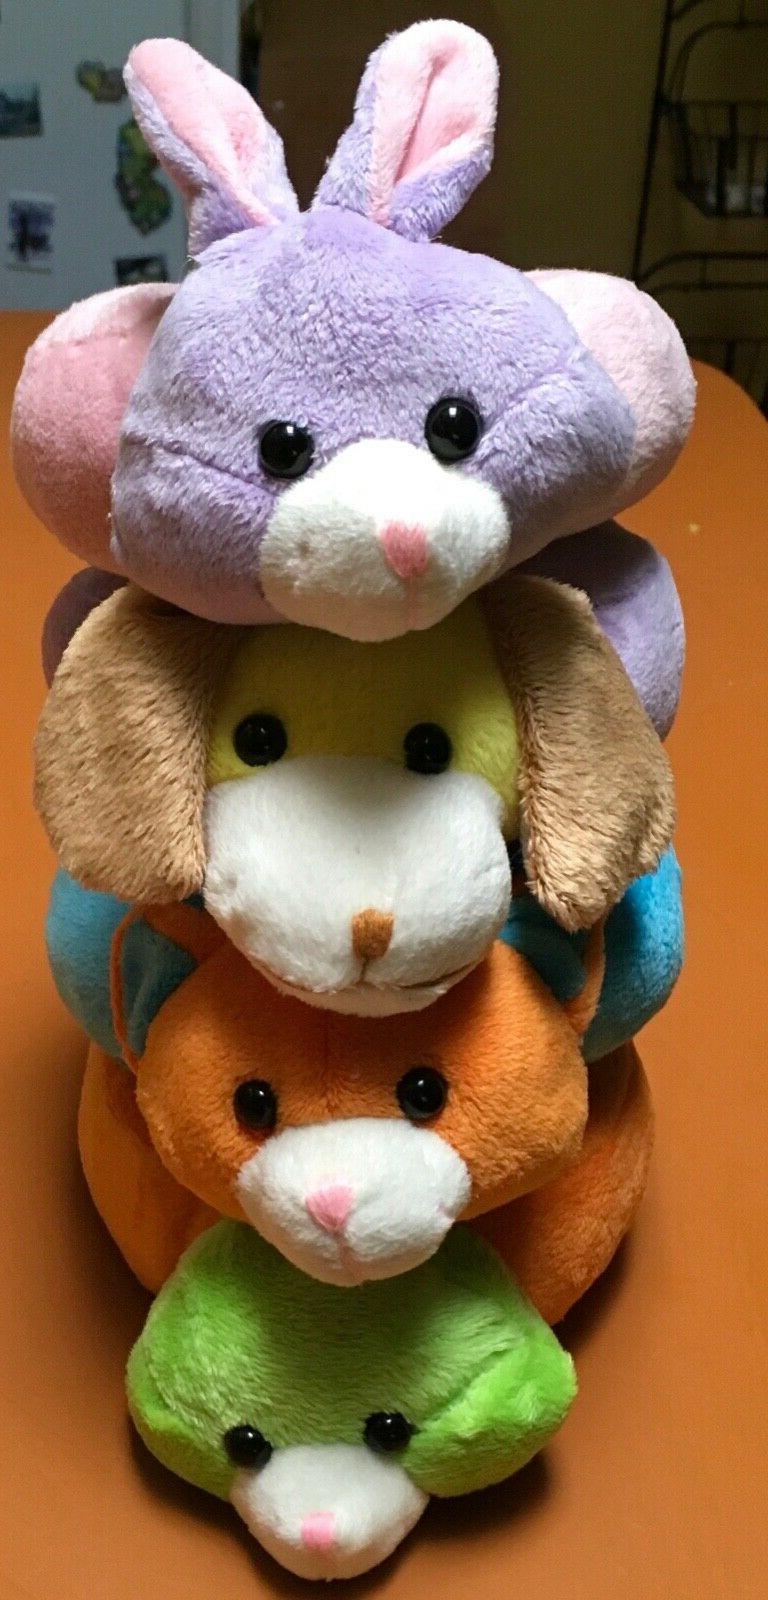 Lot of 4 Stuffed Ring Animals/Plush Toys